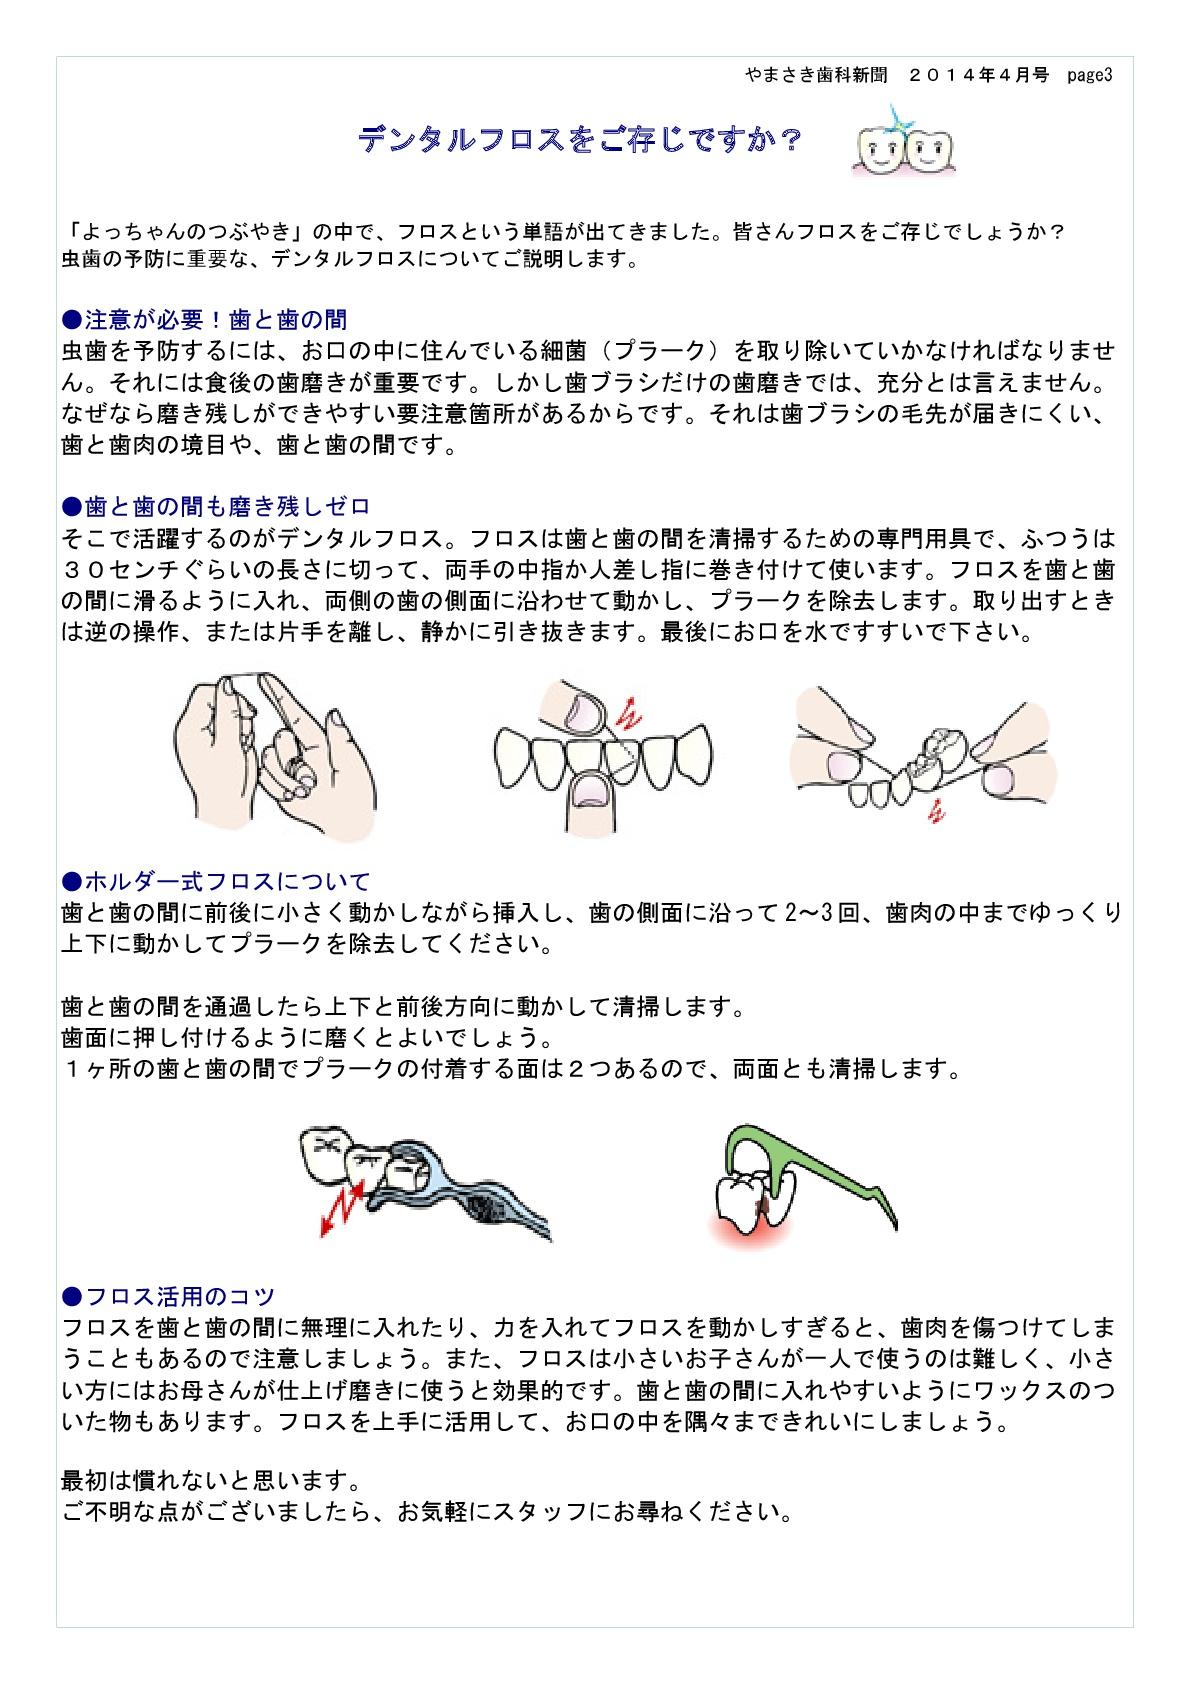 sinbun14-4-2-002